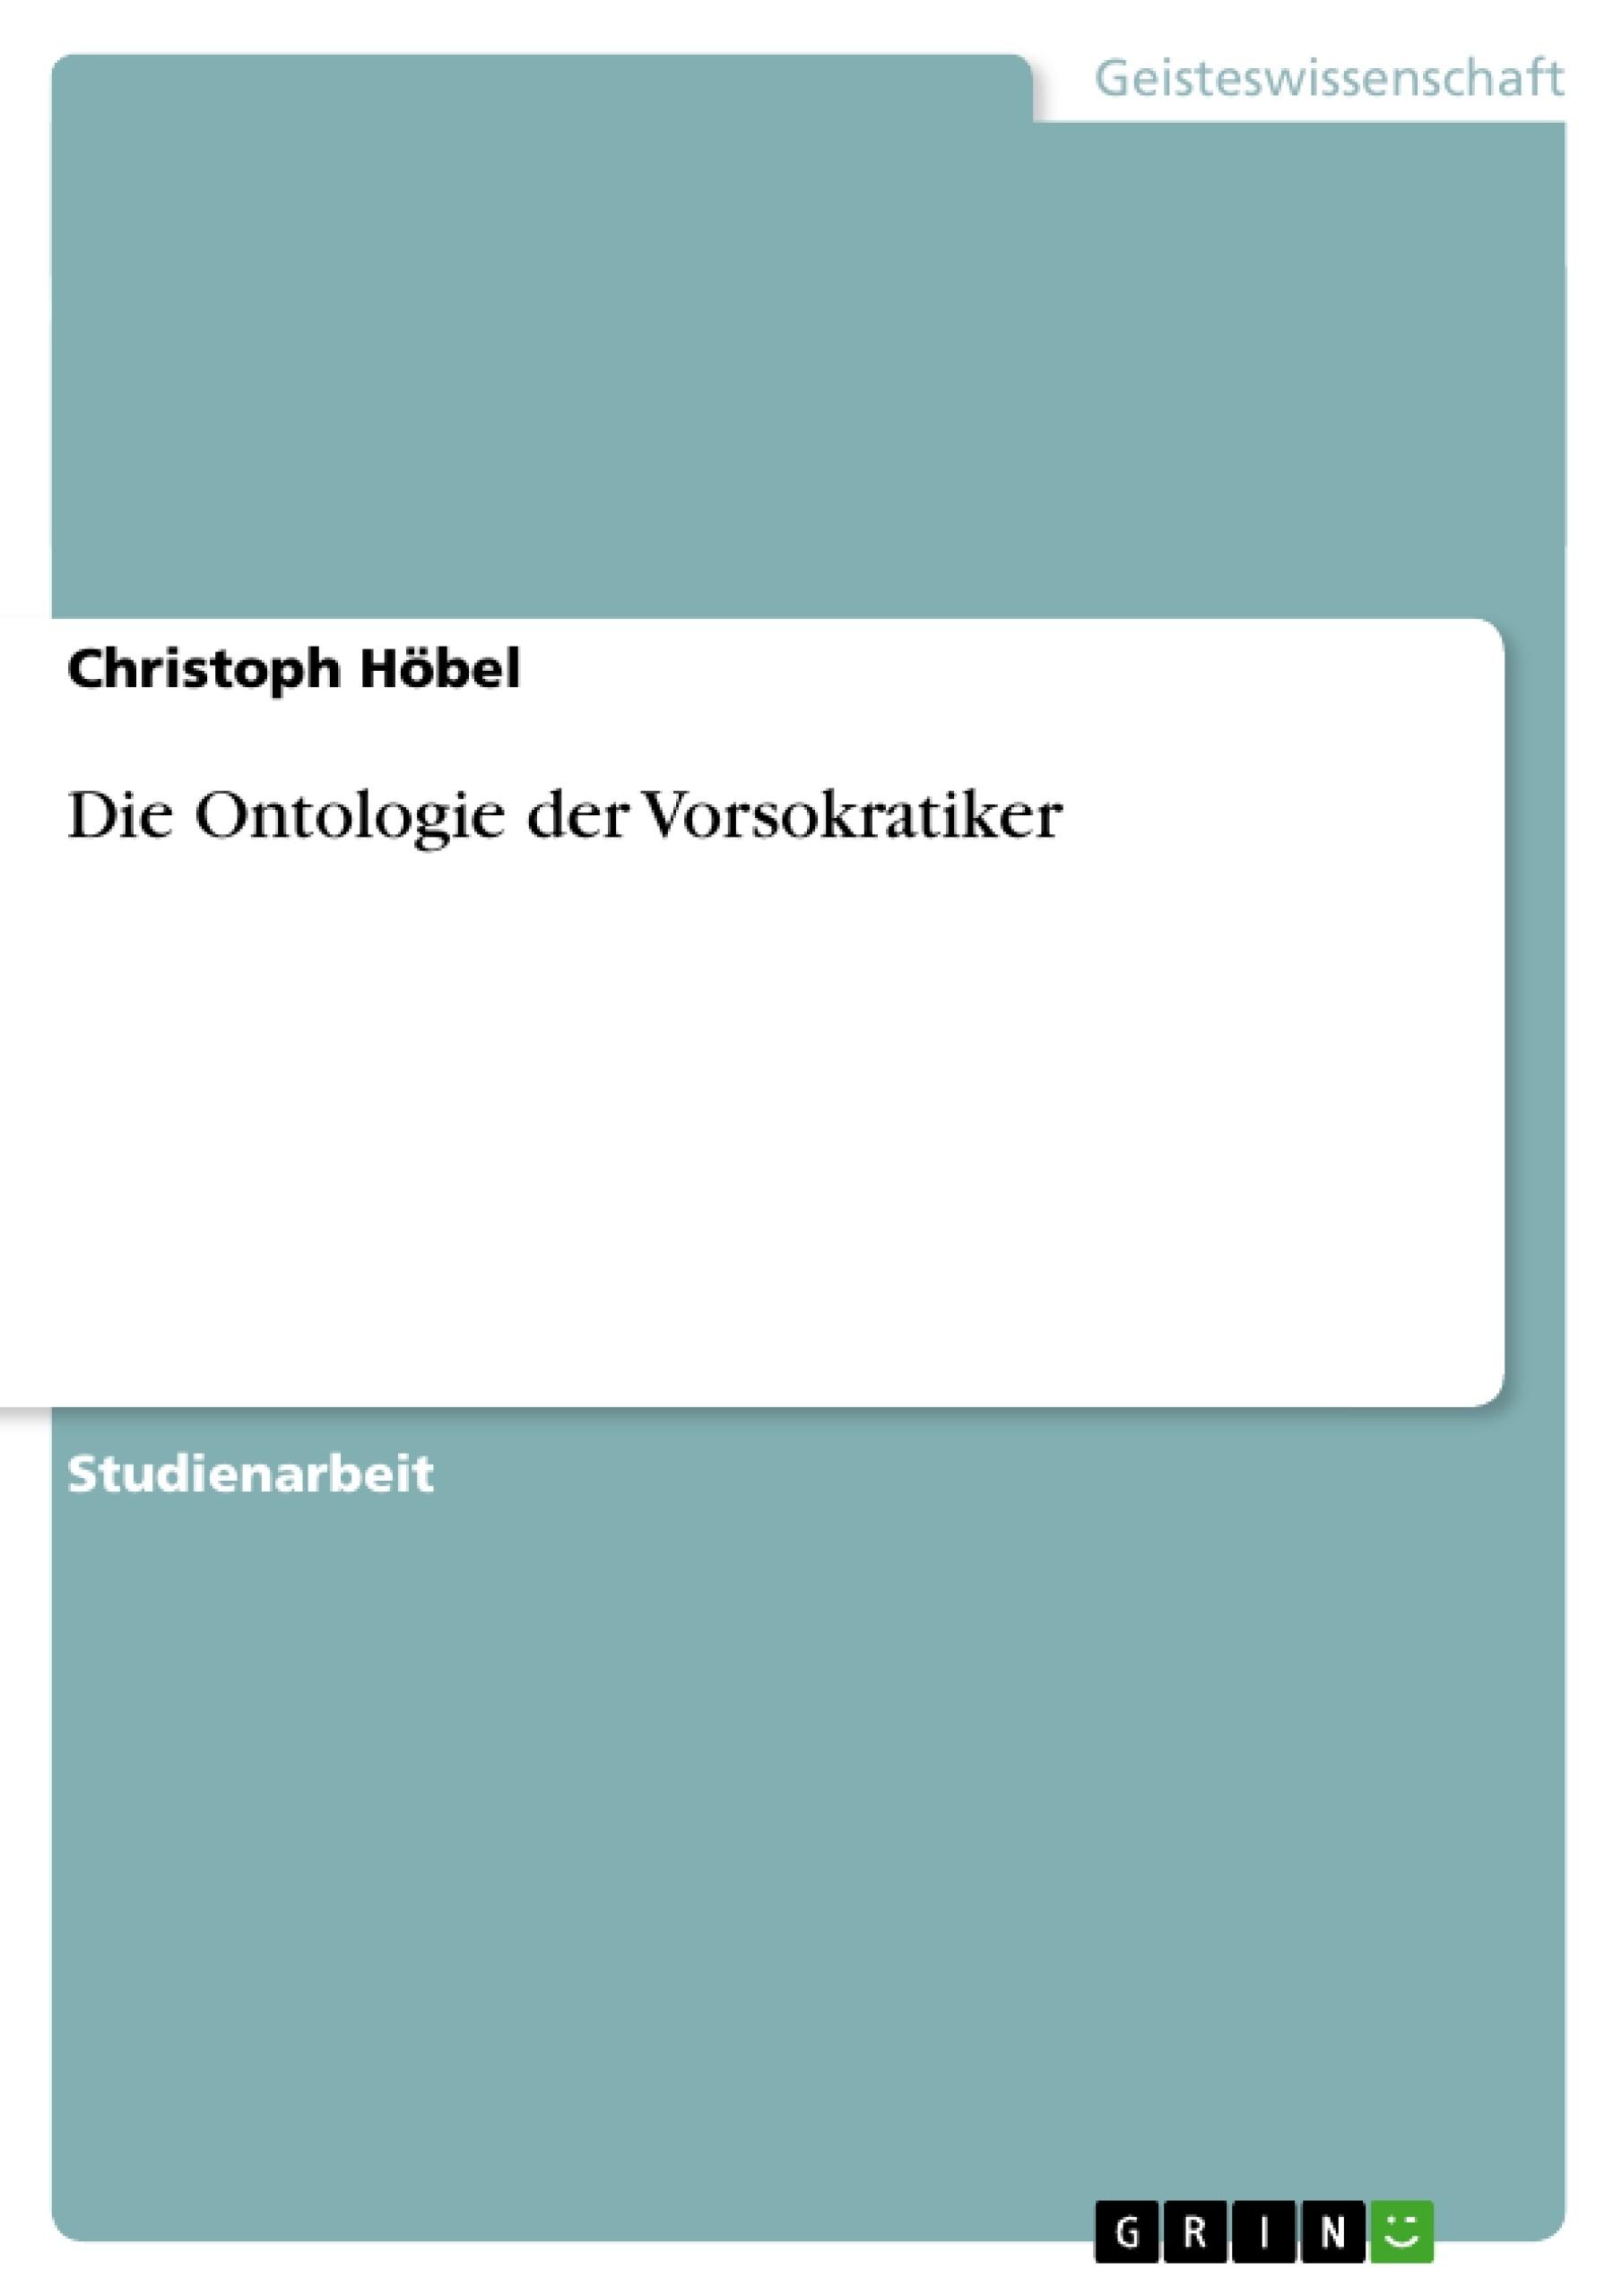 Titel: Die Ontologie der Vorsokratiker